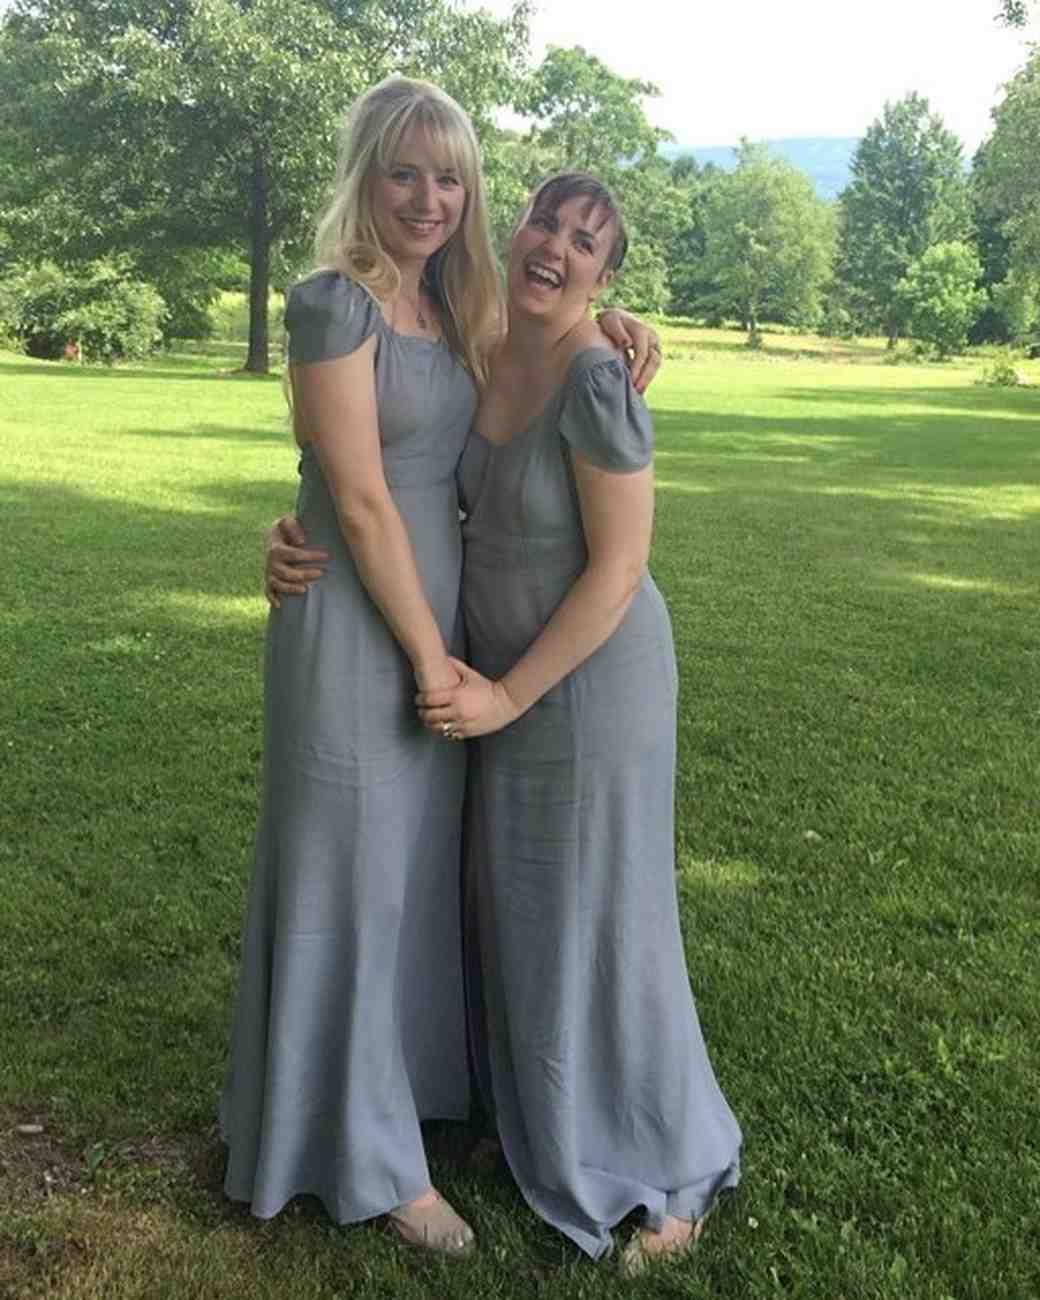 Lena Dunham was a bridesmaid at her friend's wedding